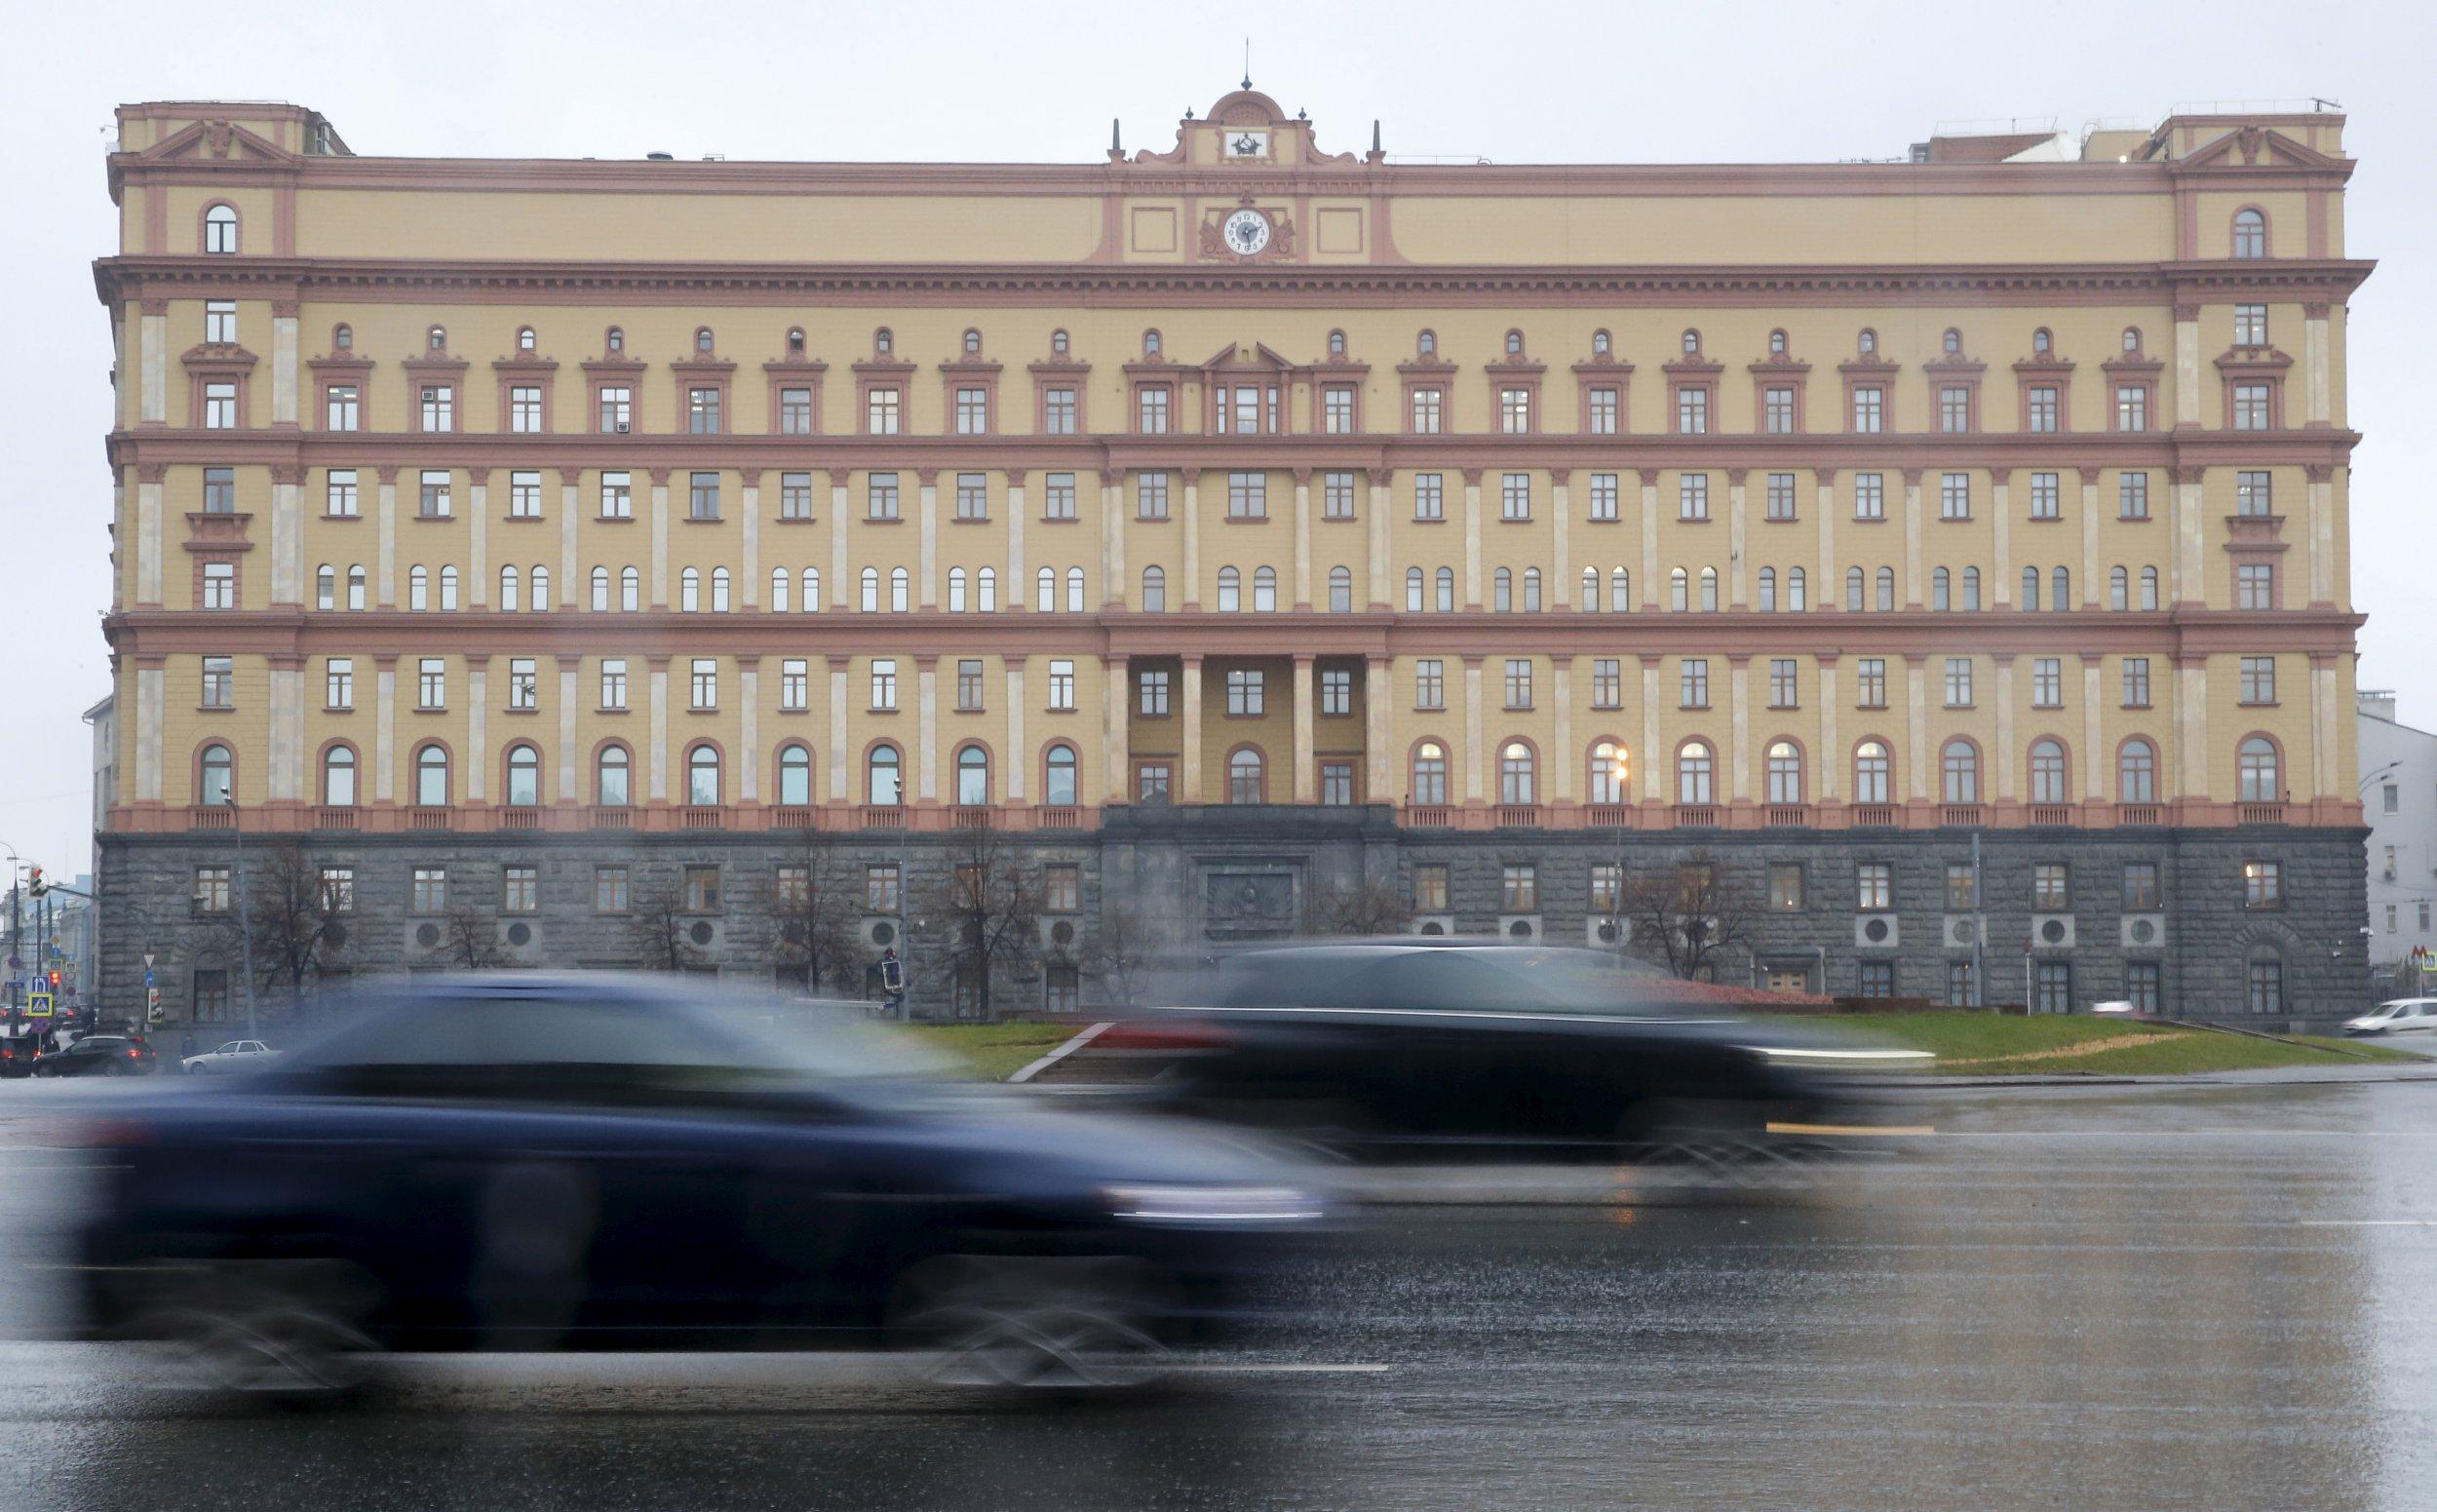 FSB headquarters in the Lubyanka, Moscow